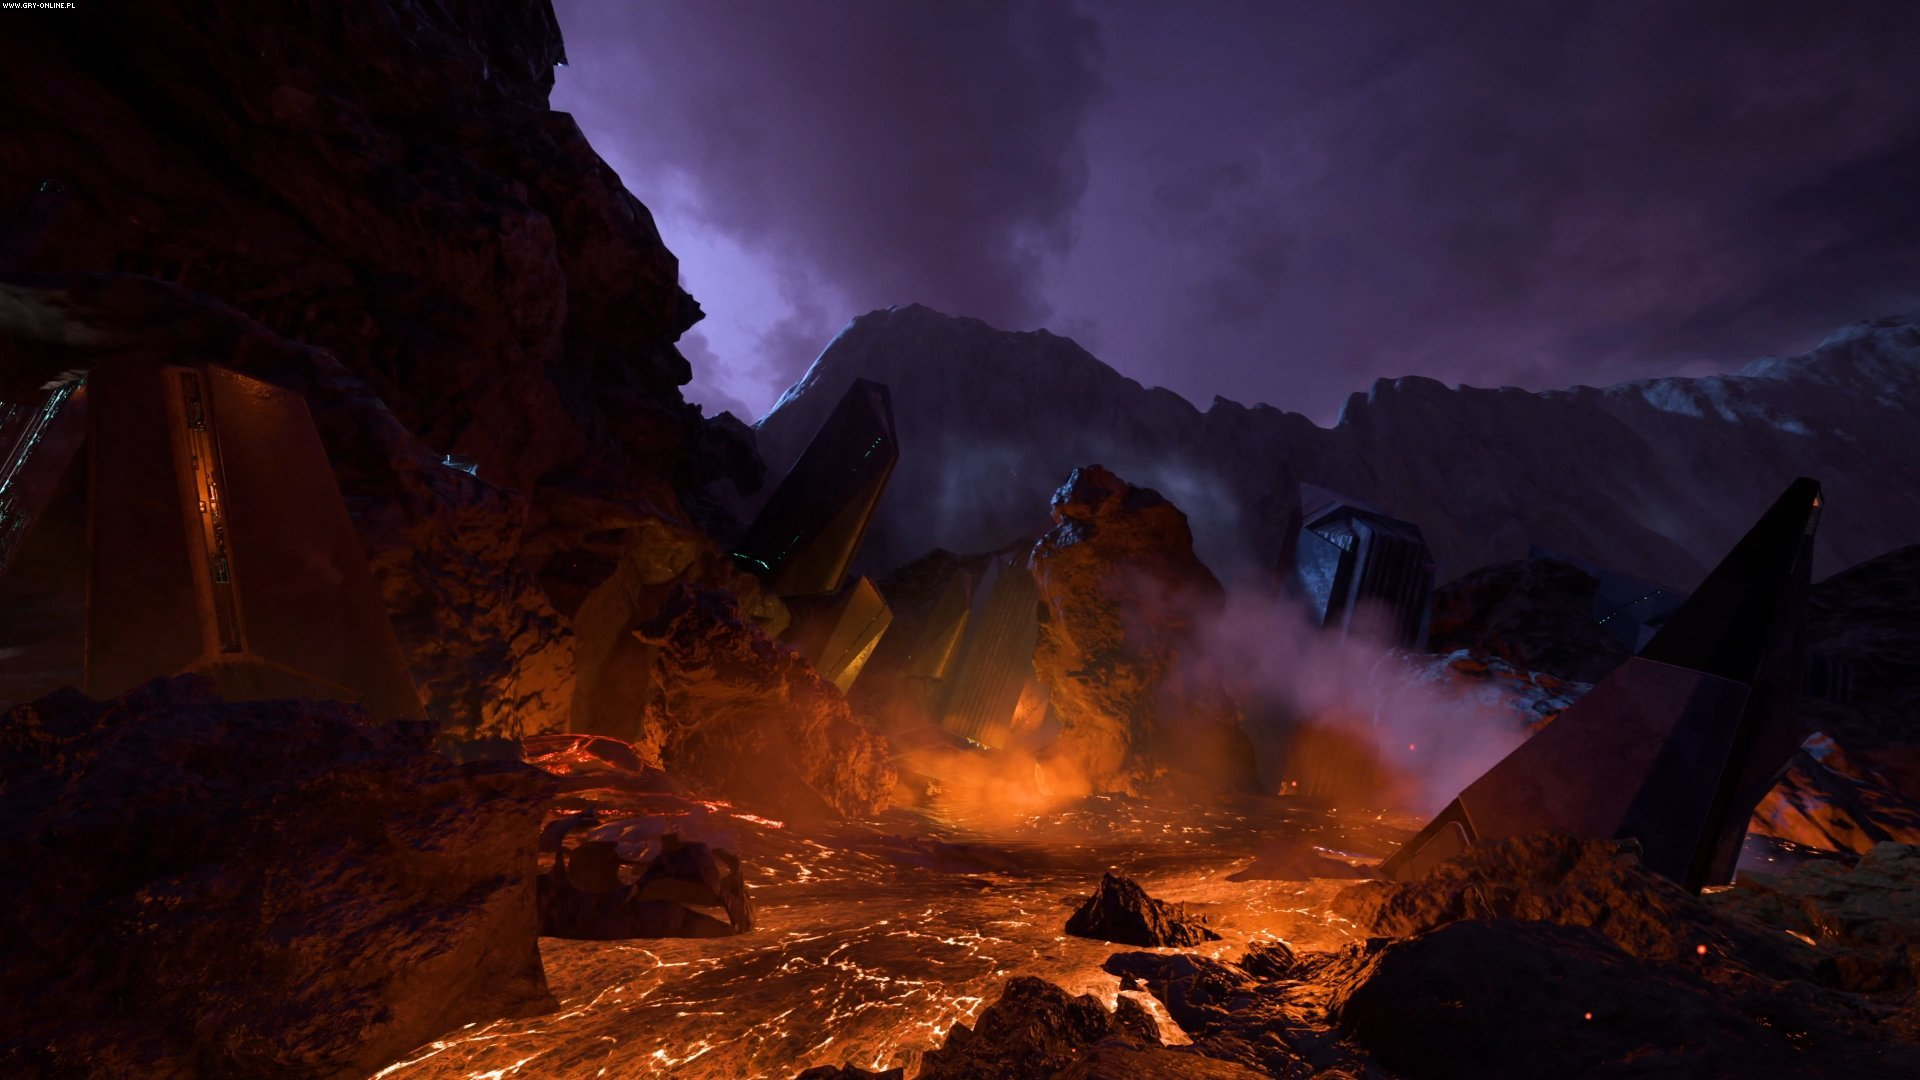 Ps4 Games Science Fiction : Mass effect andromeda screenshots gallery screenshot